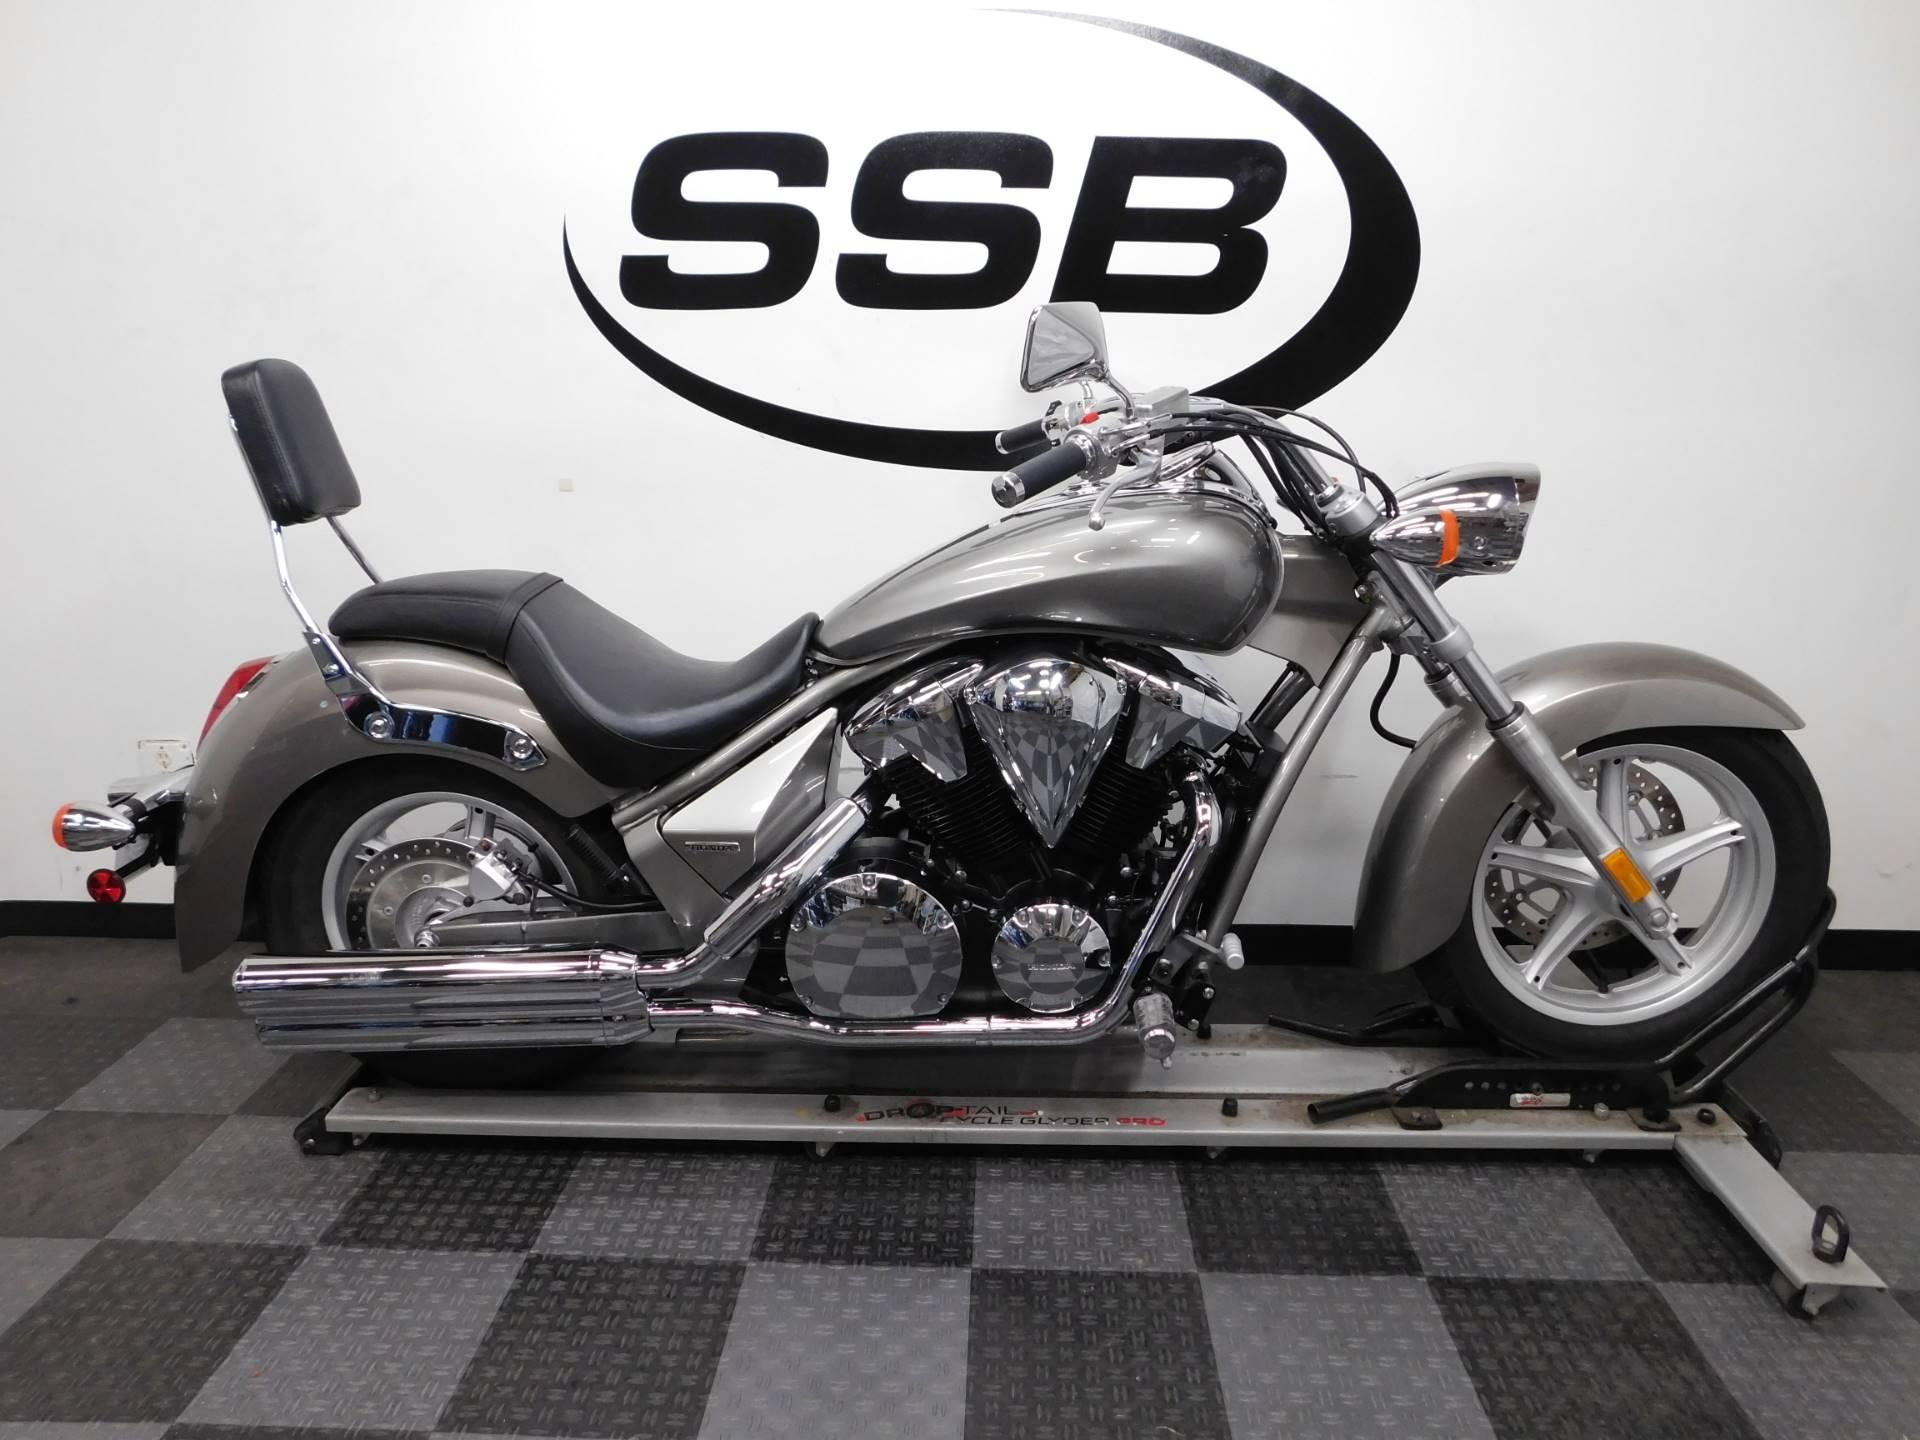 Used 2012 Honda Stateline Motorcycles in Eden Prairie, MN   Stock ...